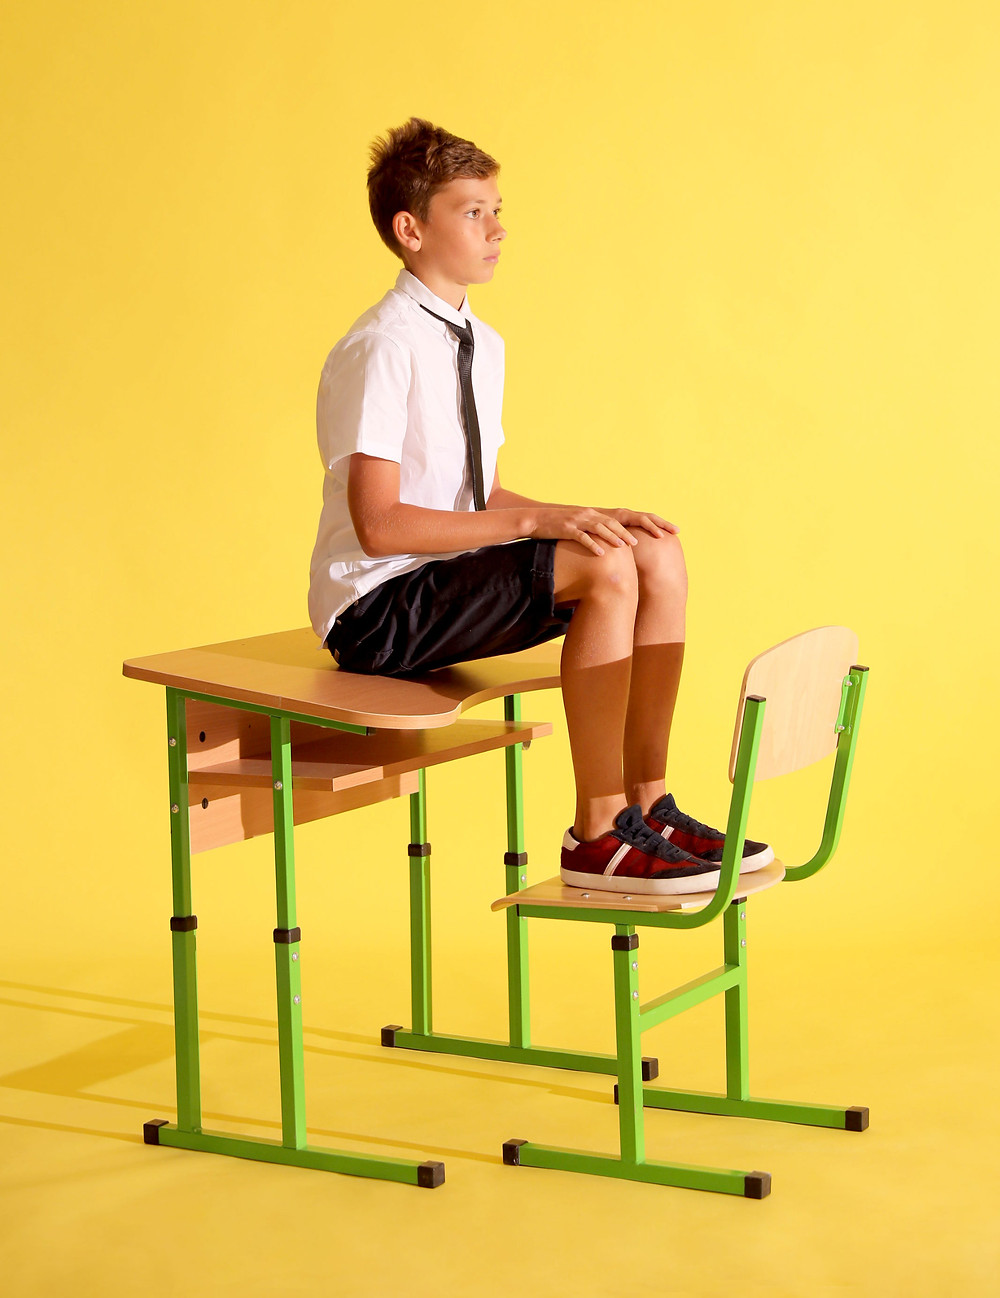 kid in school